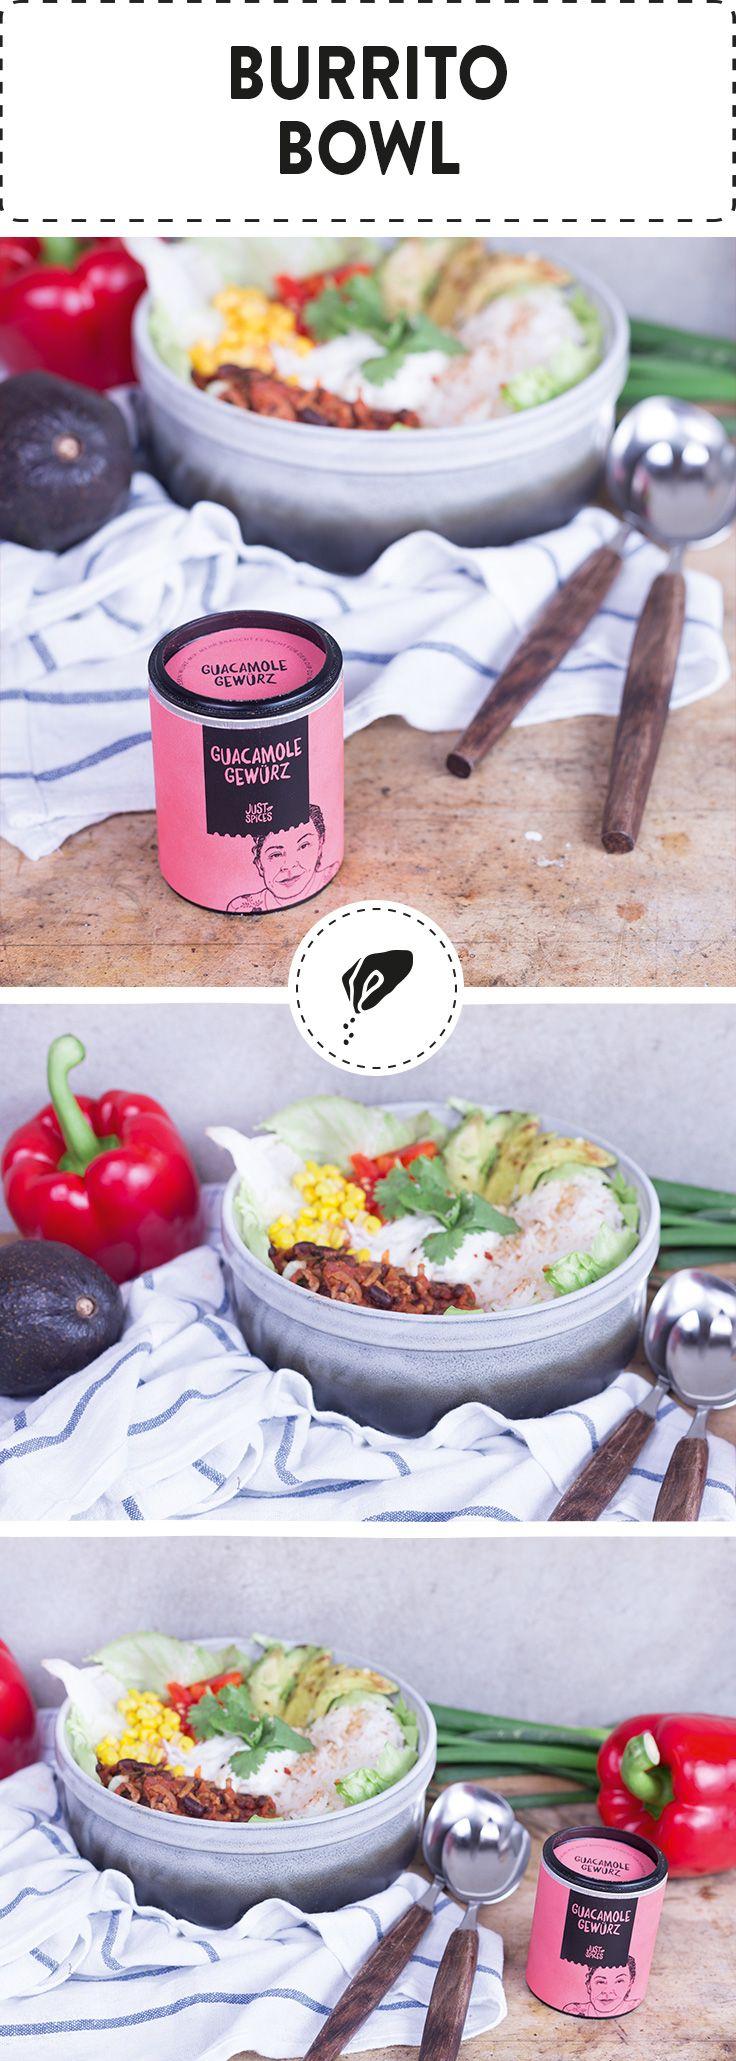 burrito bowl soul food aus liebe zum essen rezepte. Black Bedroom Furniture Sets. Home Design Ideas